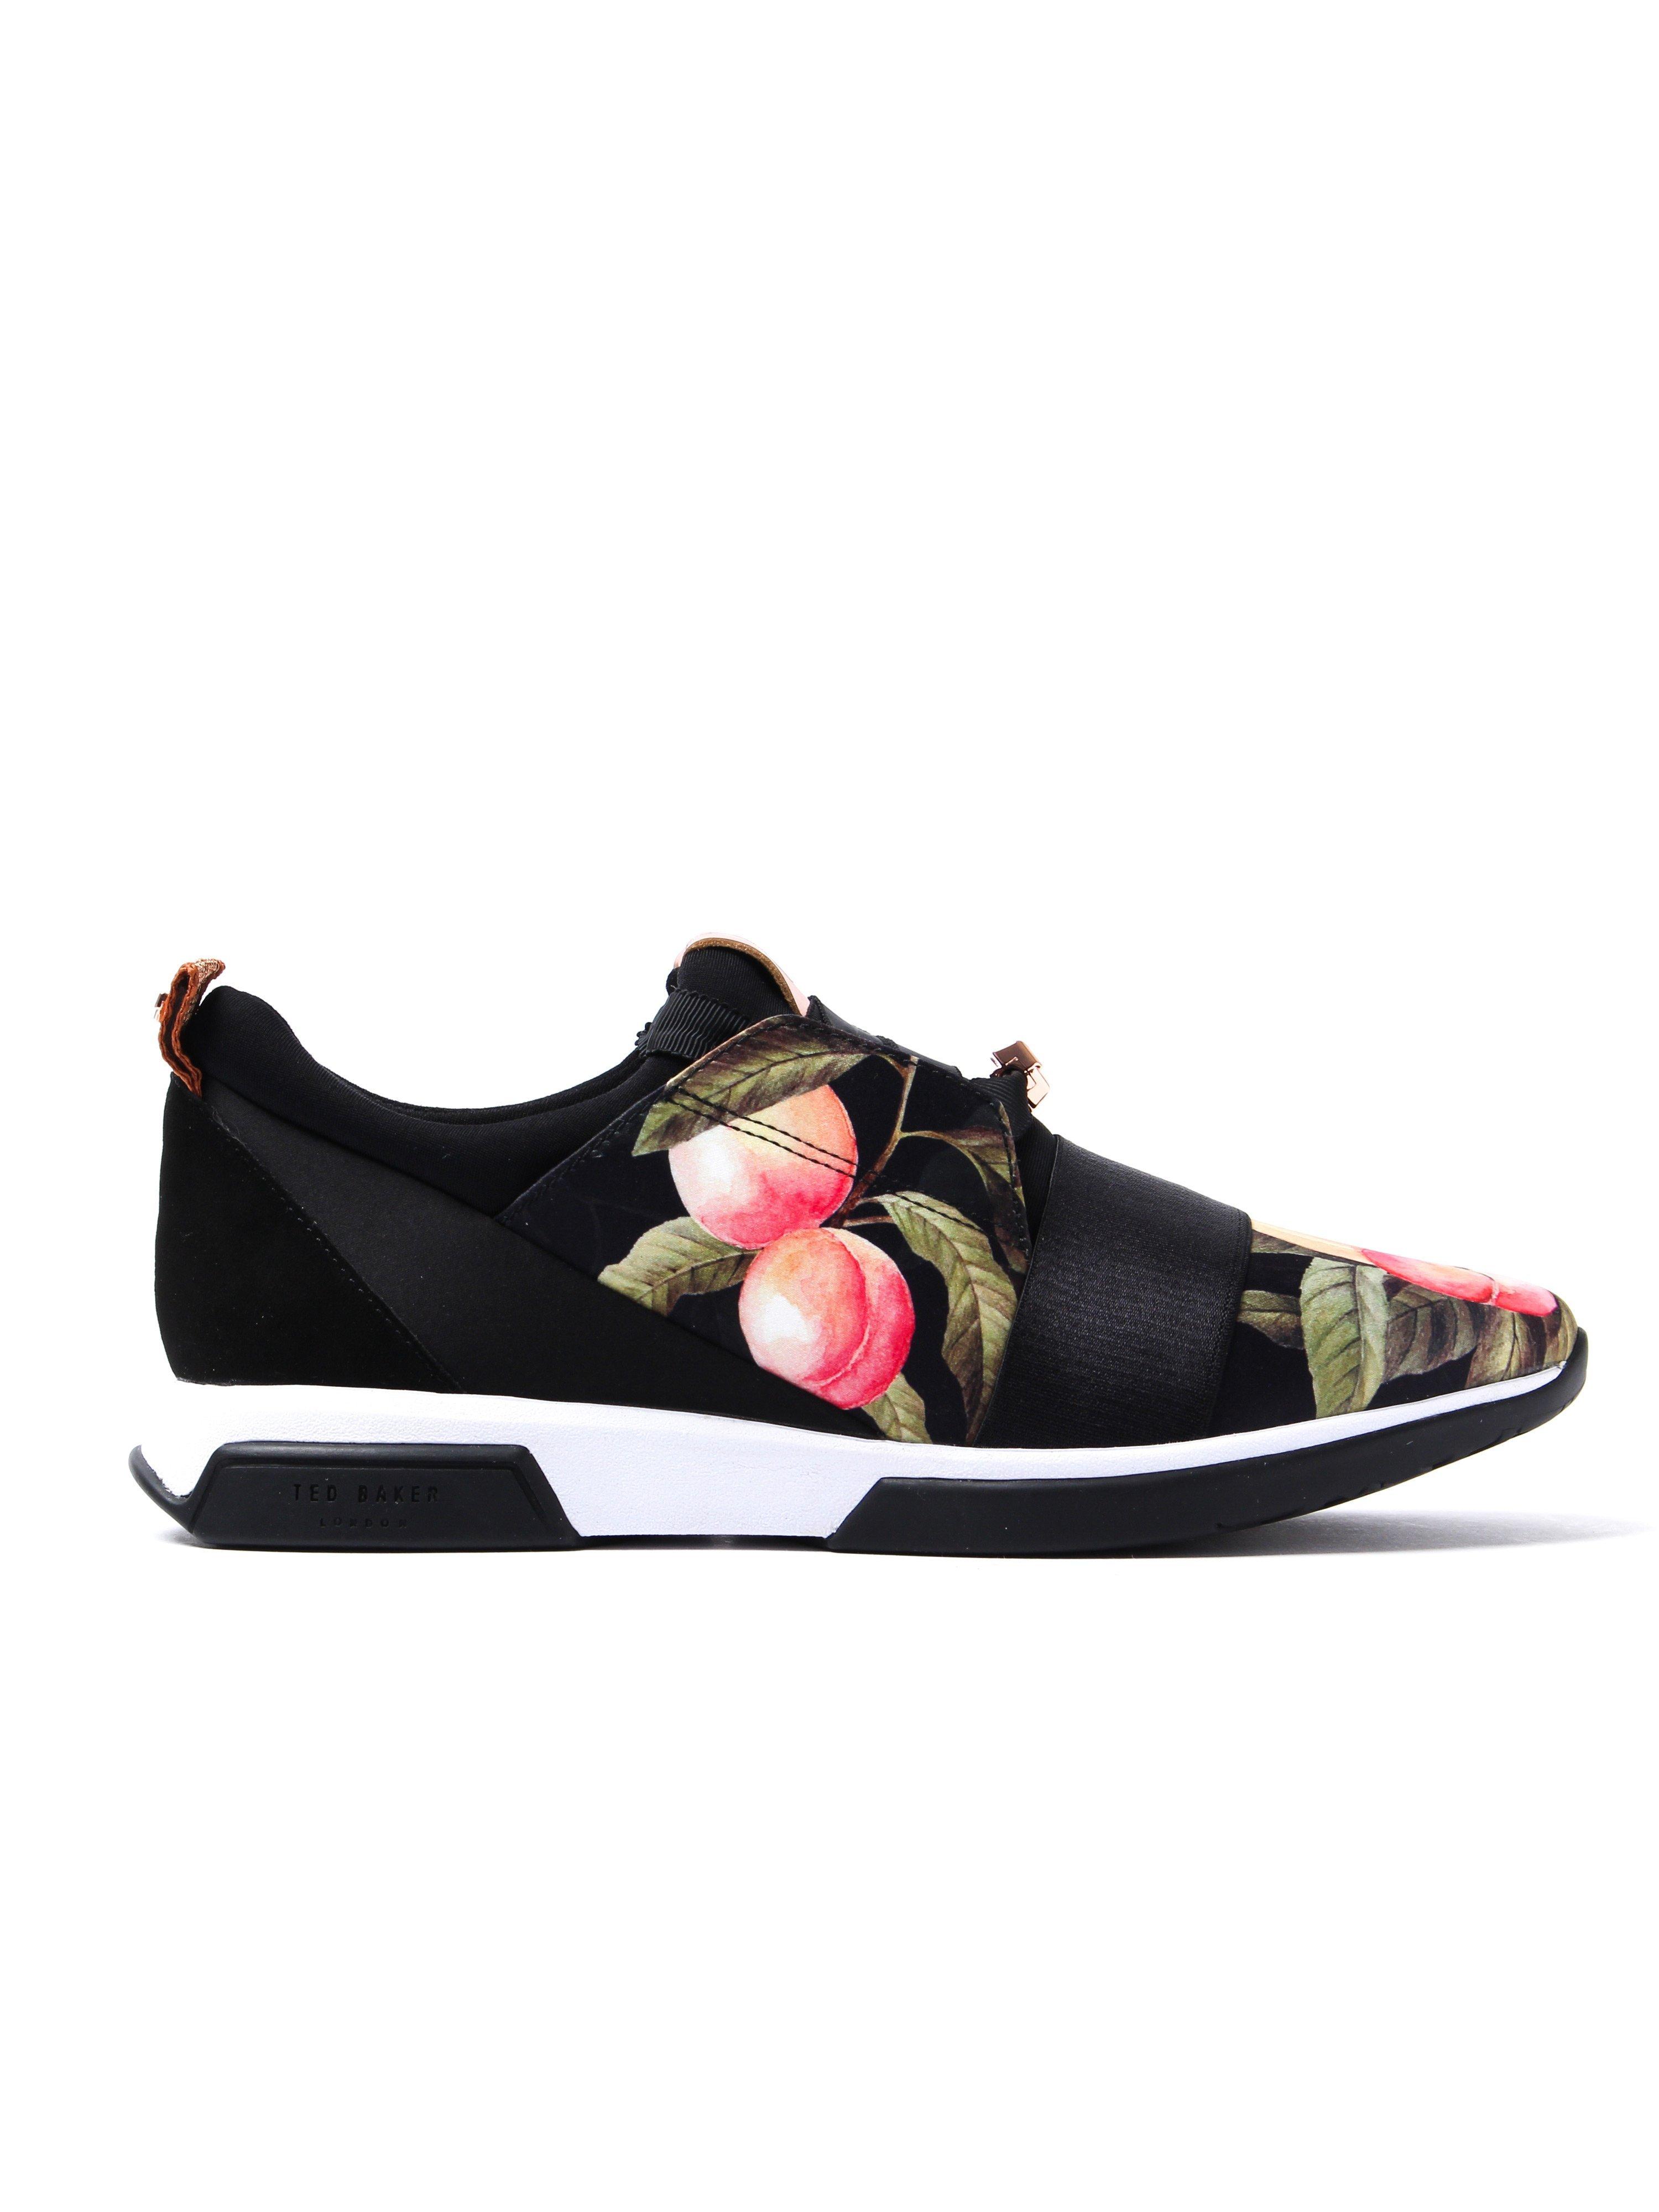 Ted Baker Women's Cepap Trainers - Black Peach Blossom